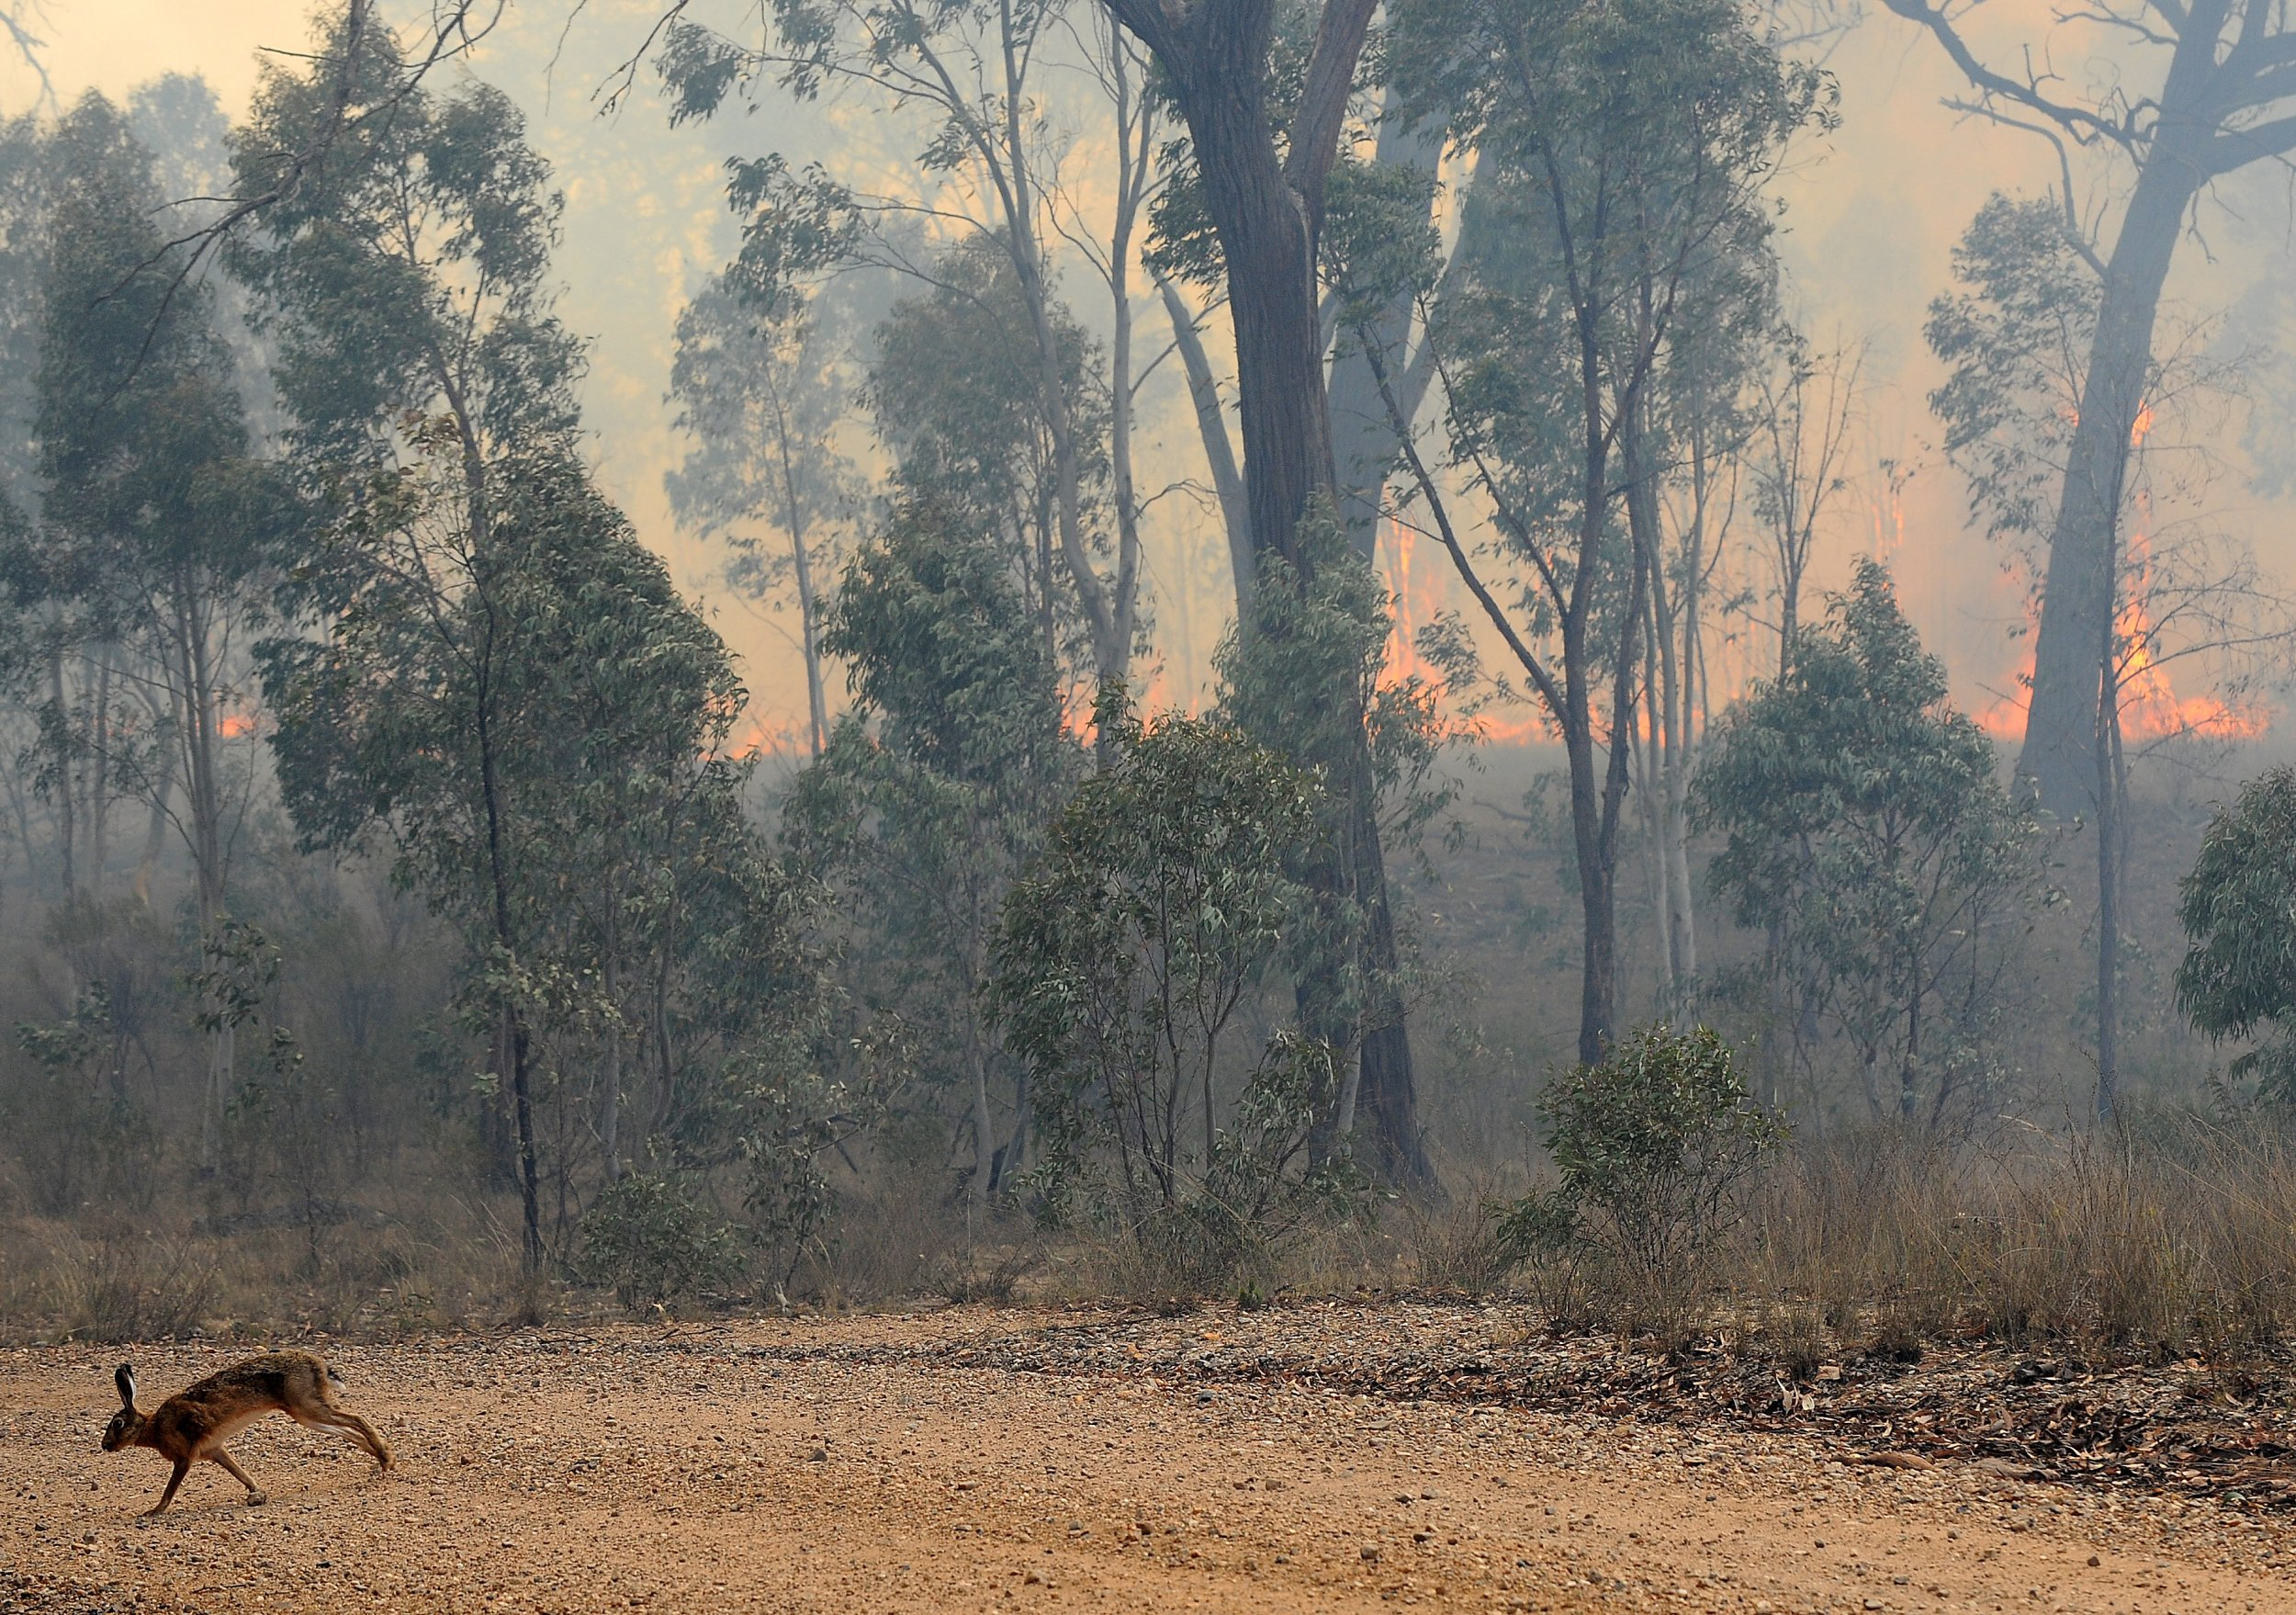 01_08_wildfire_australia_ecology